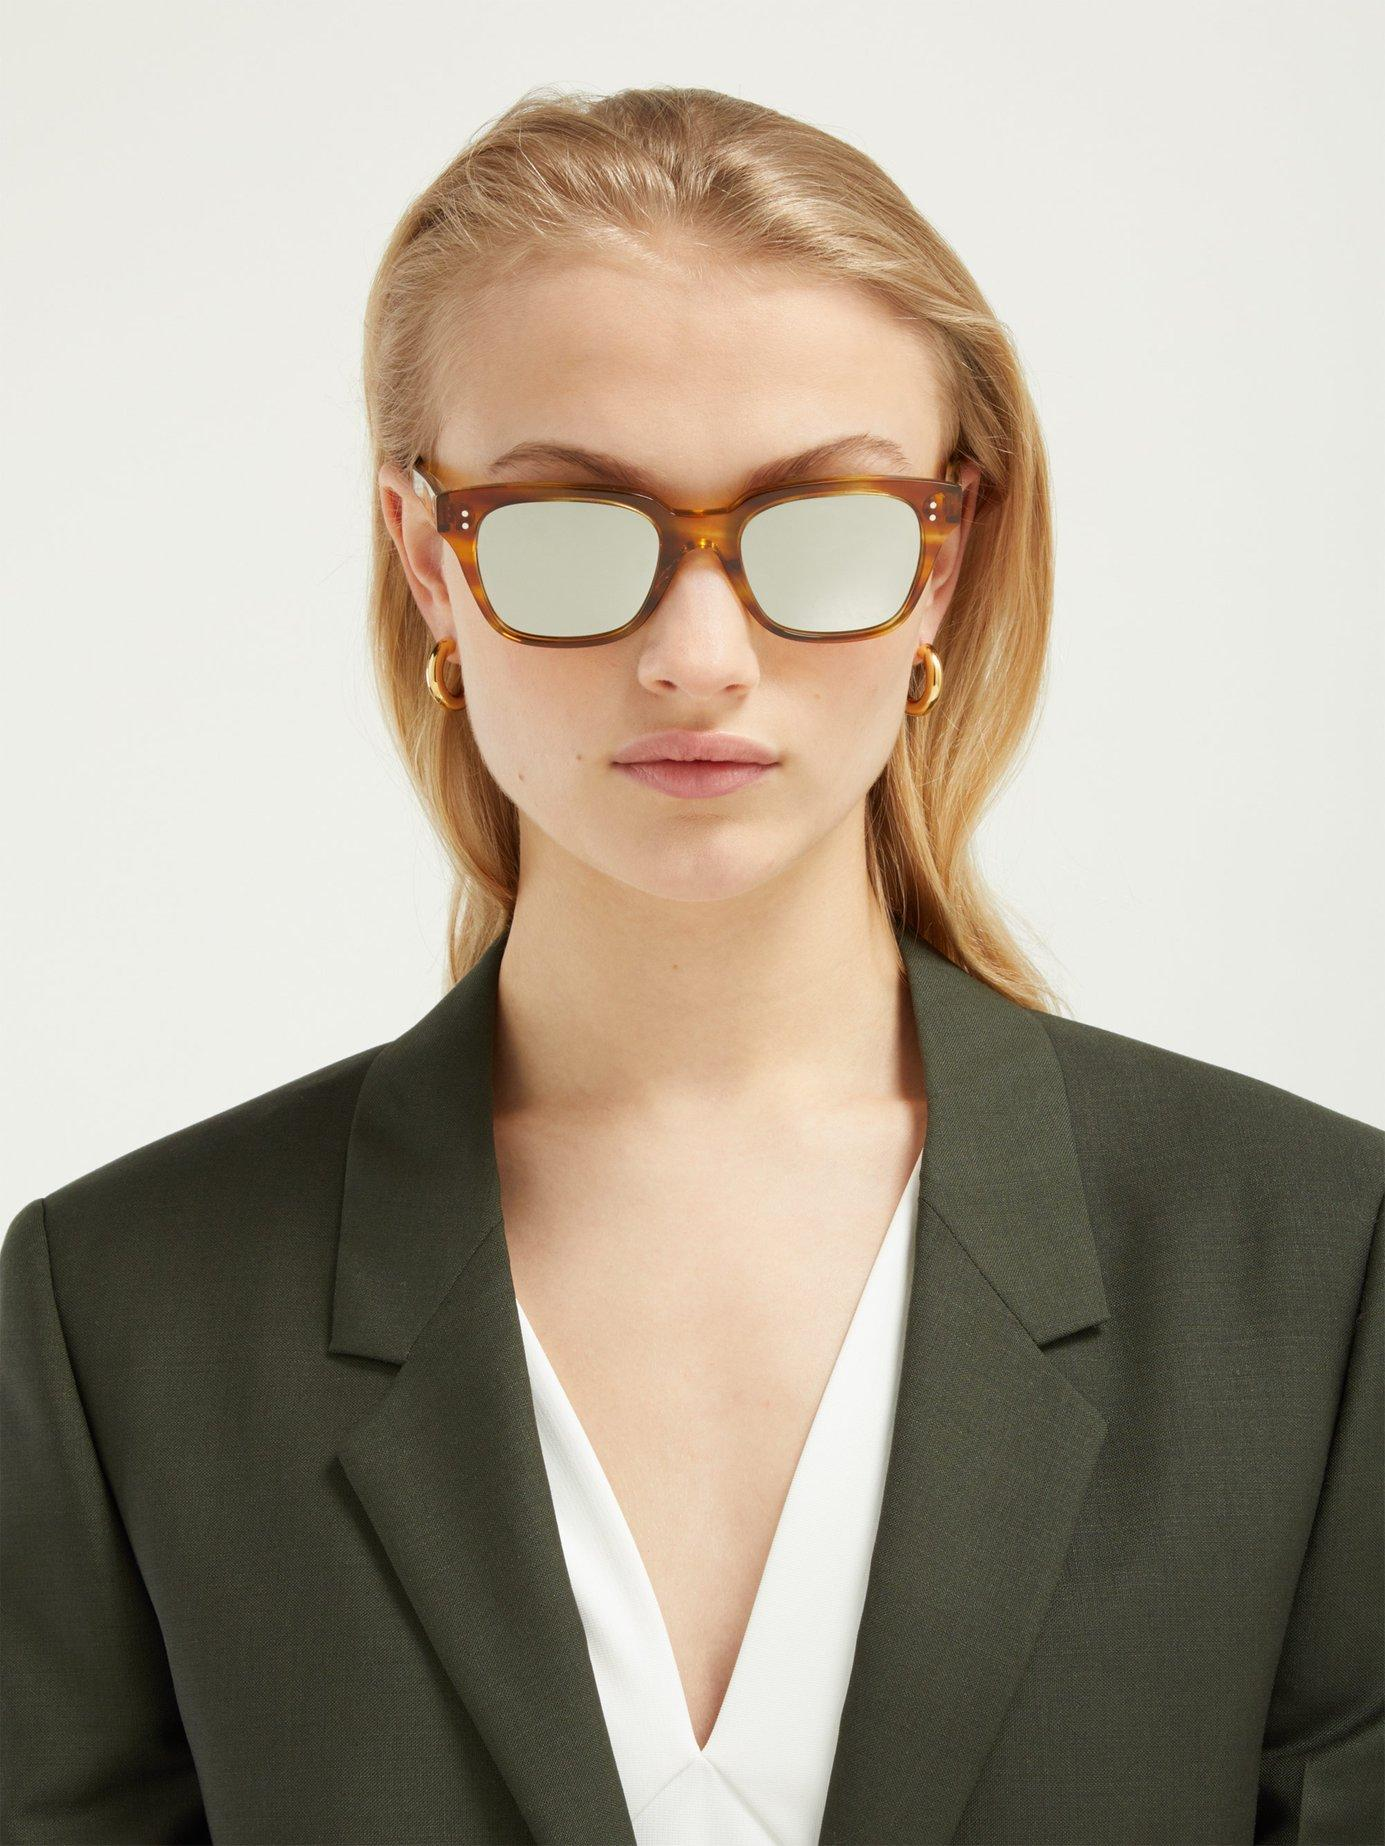 Mirrored Sunglasses Mirrored D Women's D Frame Women's BrCeodx